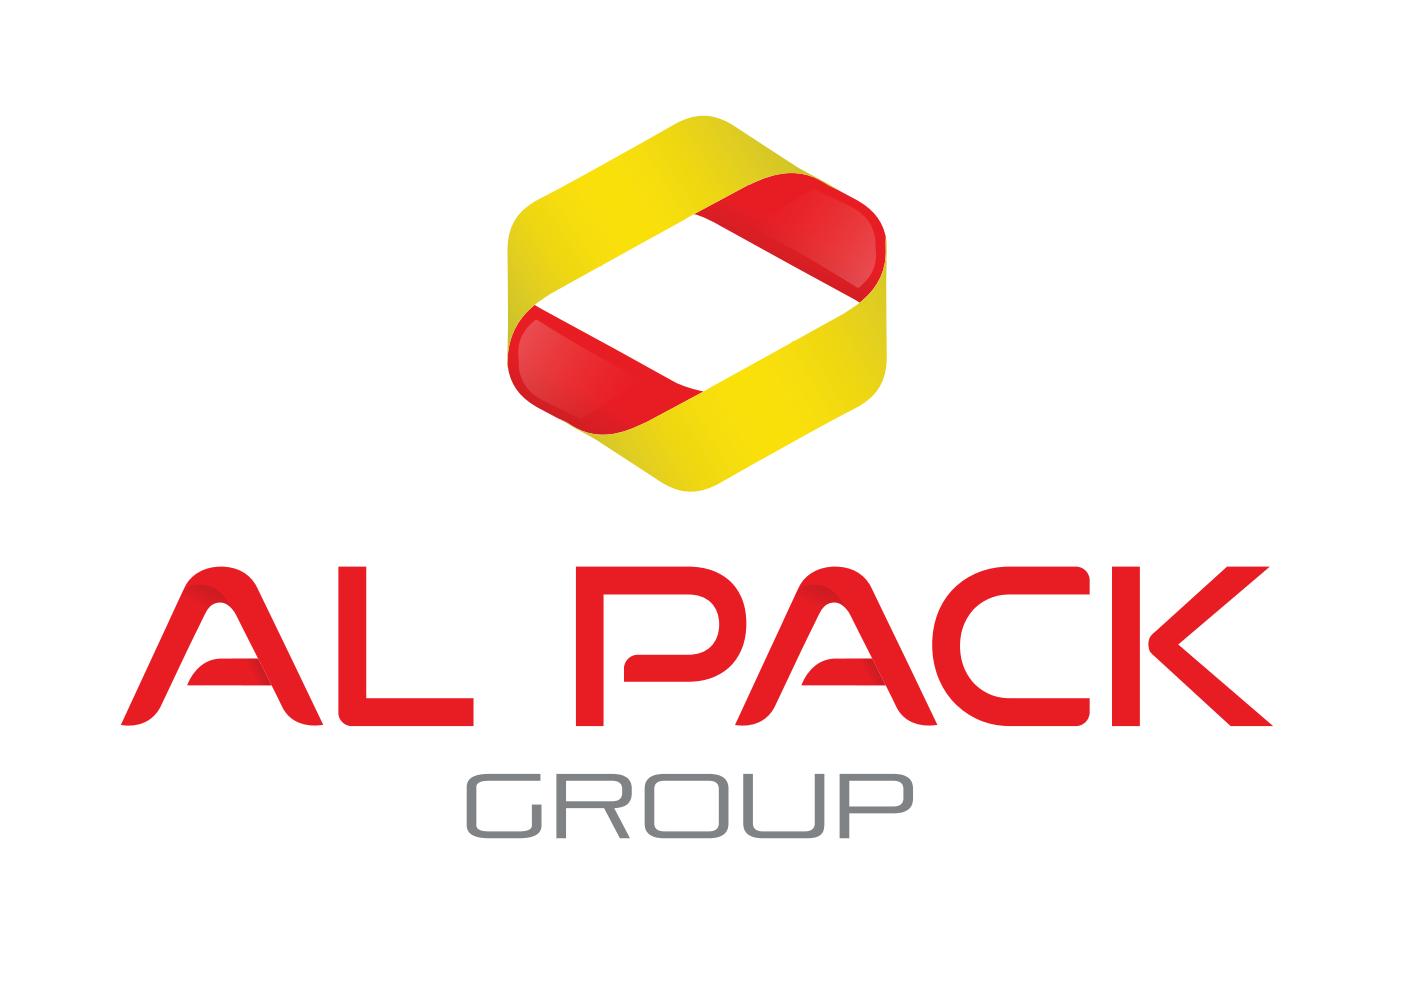 Al Pack